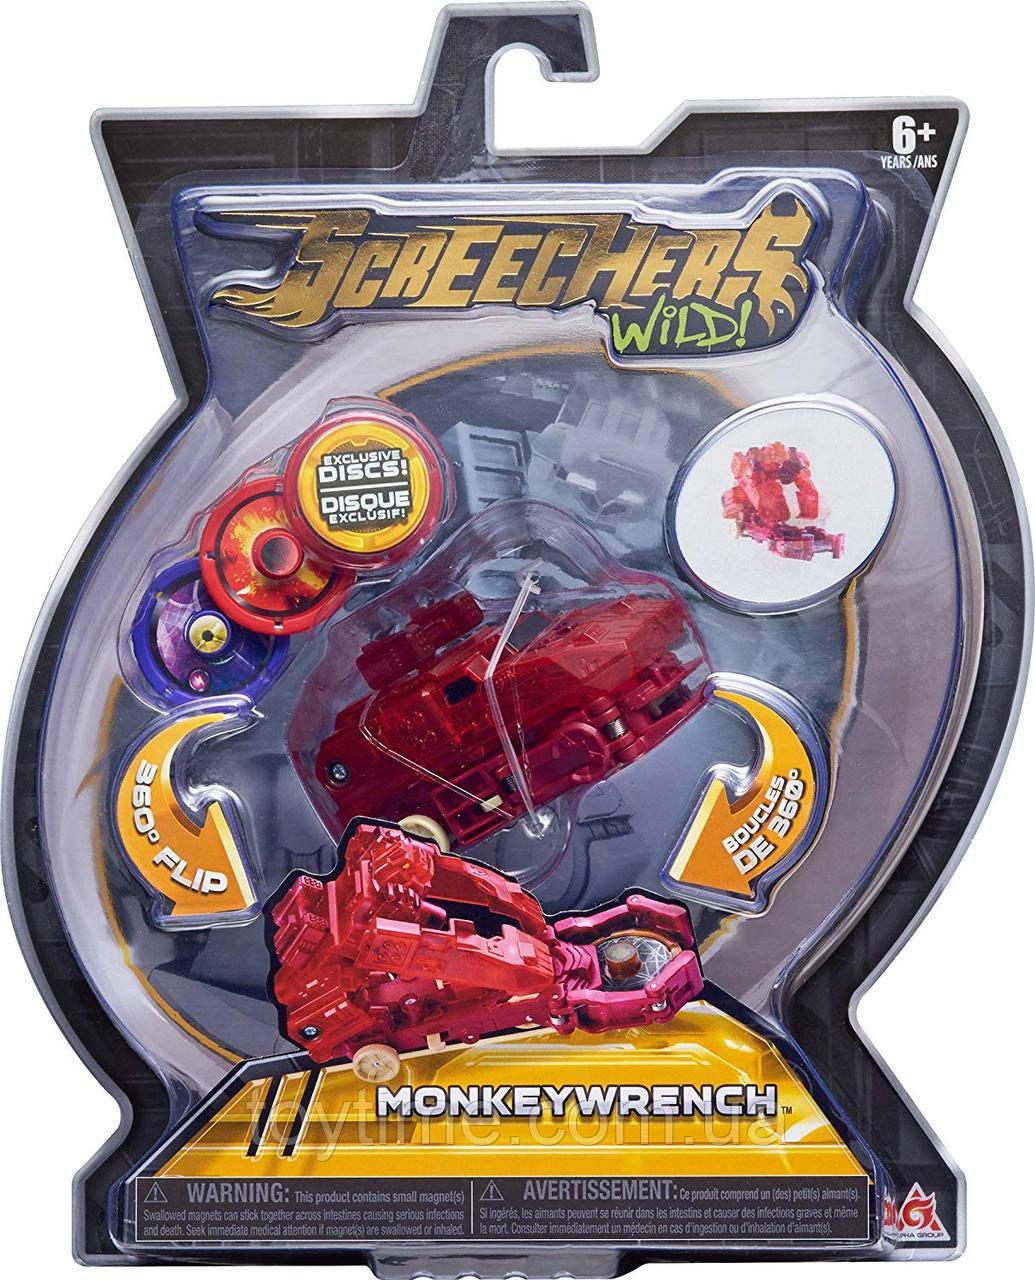 Машинка-трансформер Скричерс - МанкиРенч - Уровень 2 / Screechers Wild - Monkey Wrench - Level 2